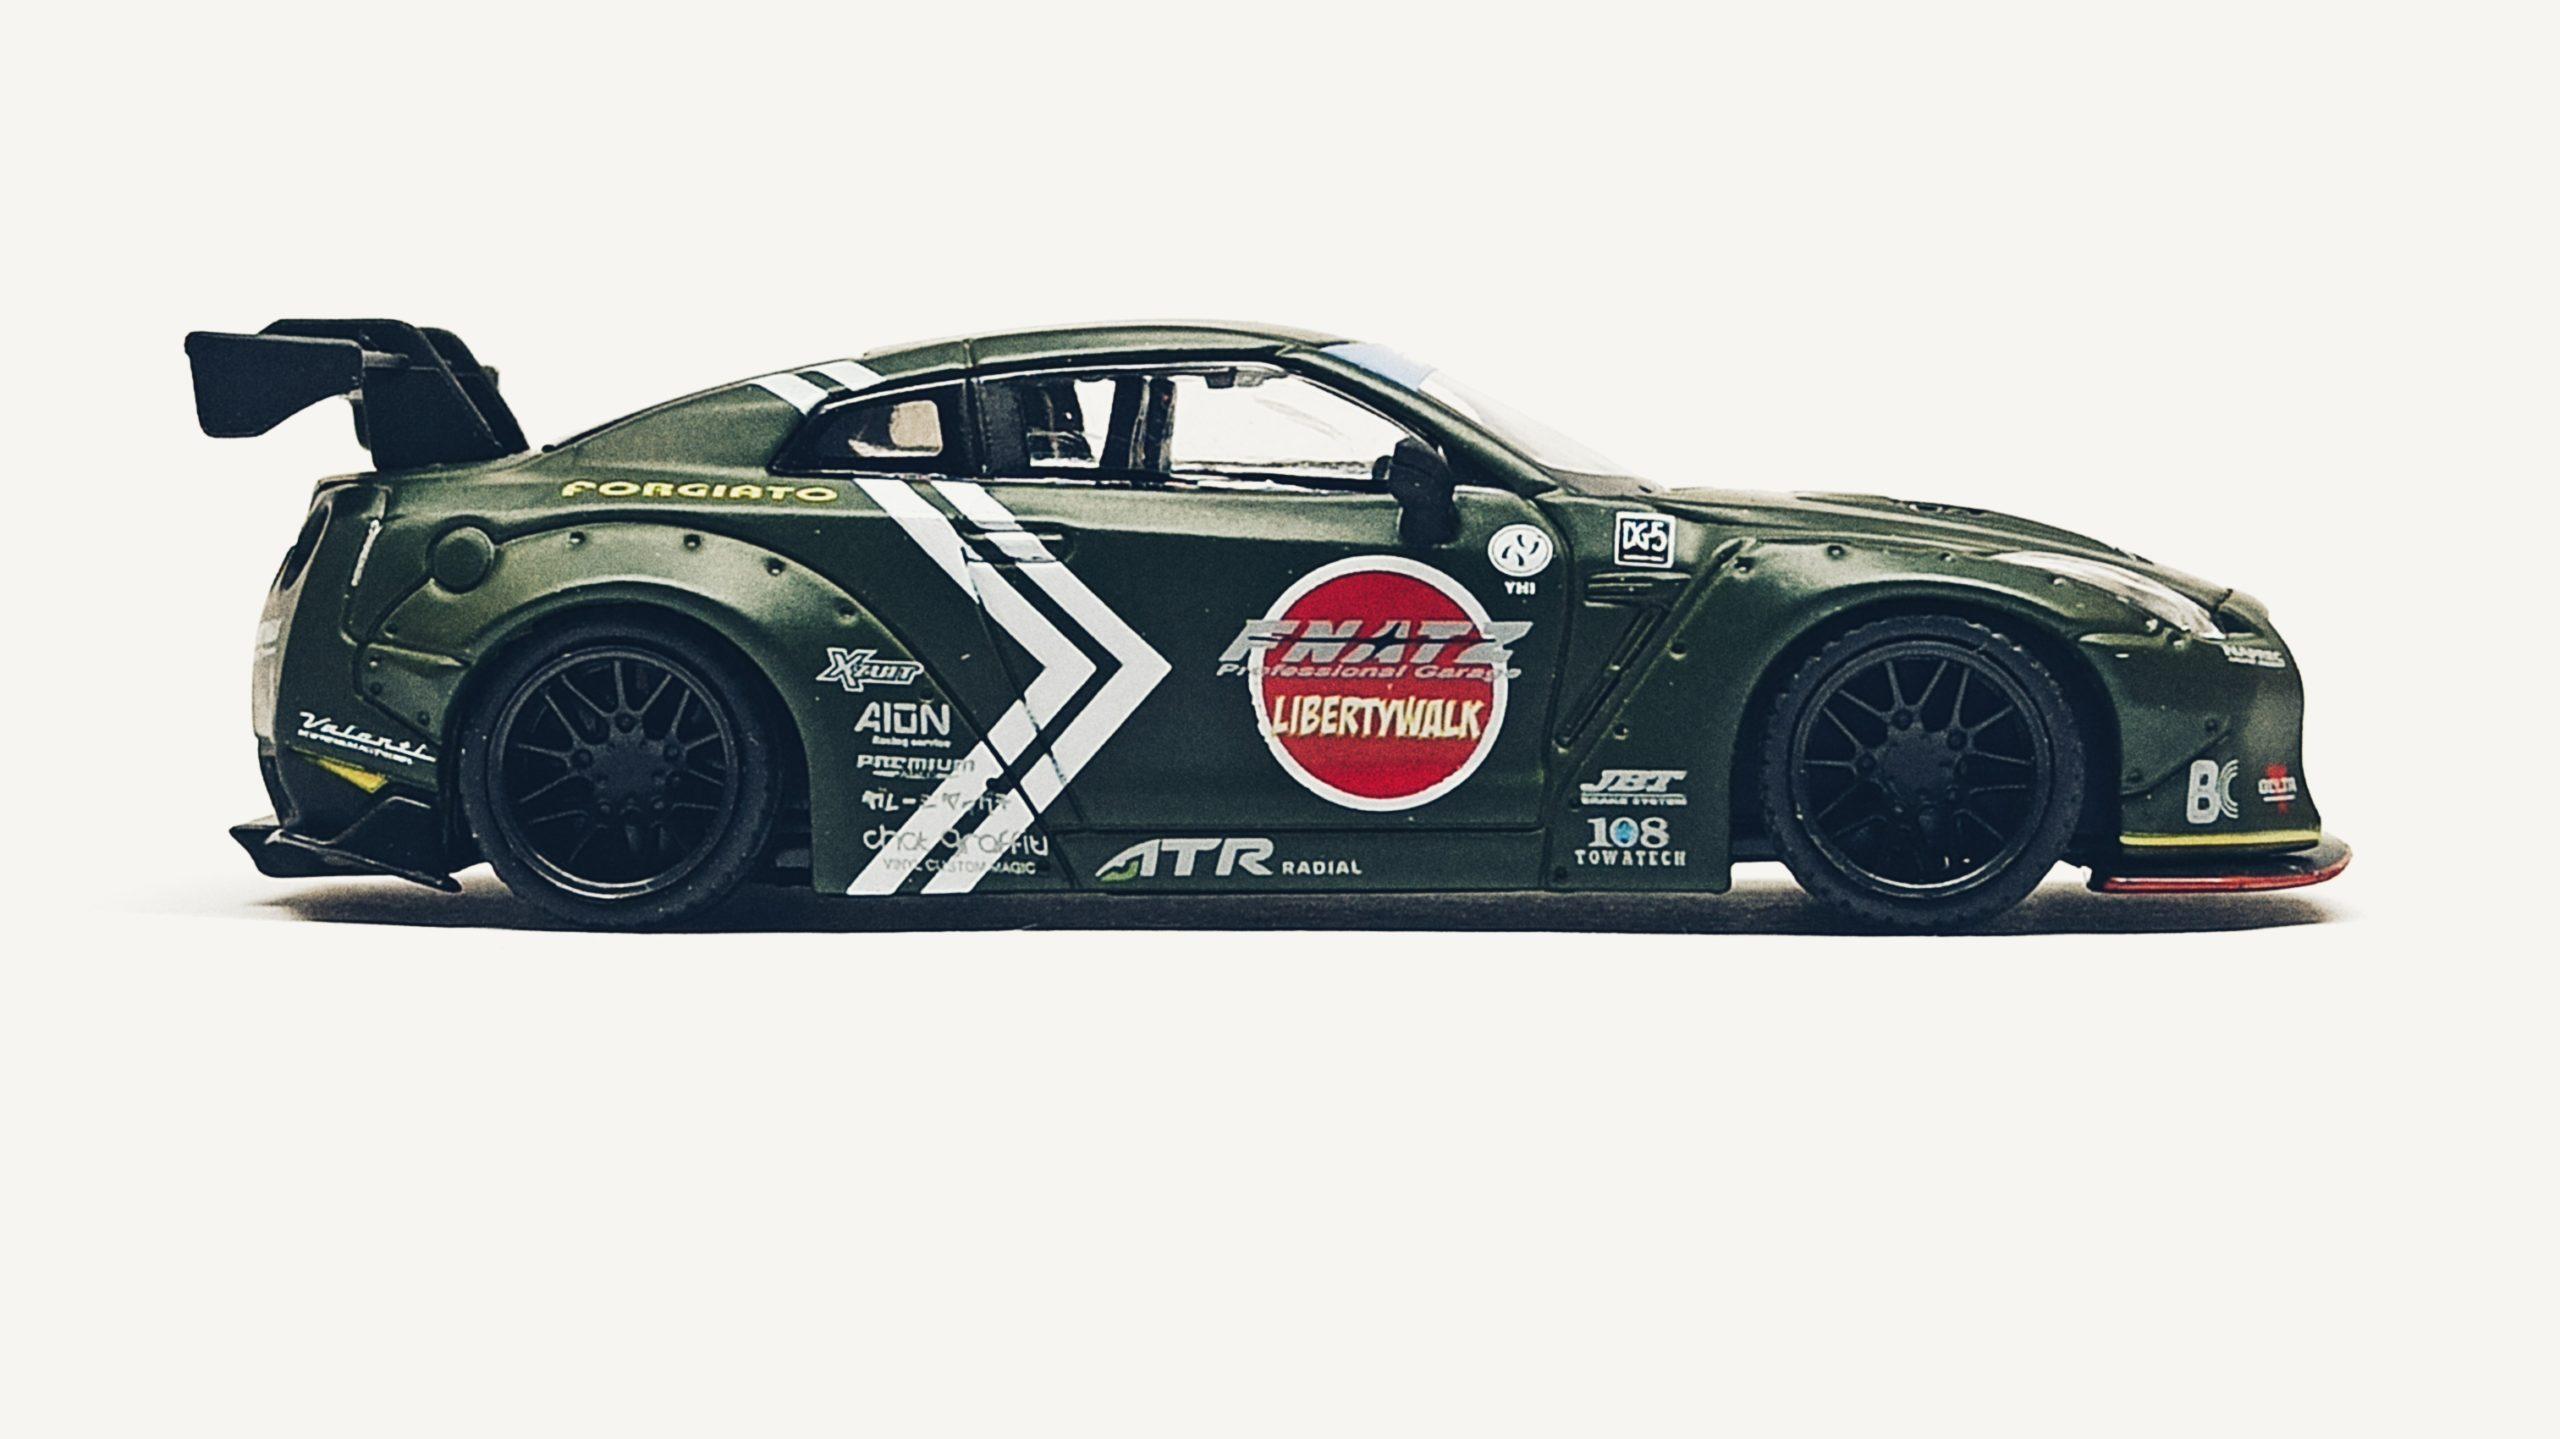 Mini GT Nissan GT-R (R35) (MGT00007-R) 2018 Liberty Walk LB★Works Type 1 Rear Wing ver 1 Zero Fighter Special (RHD) side